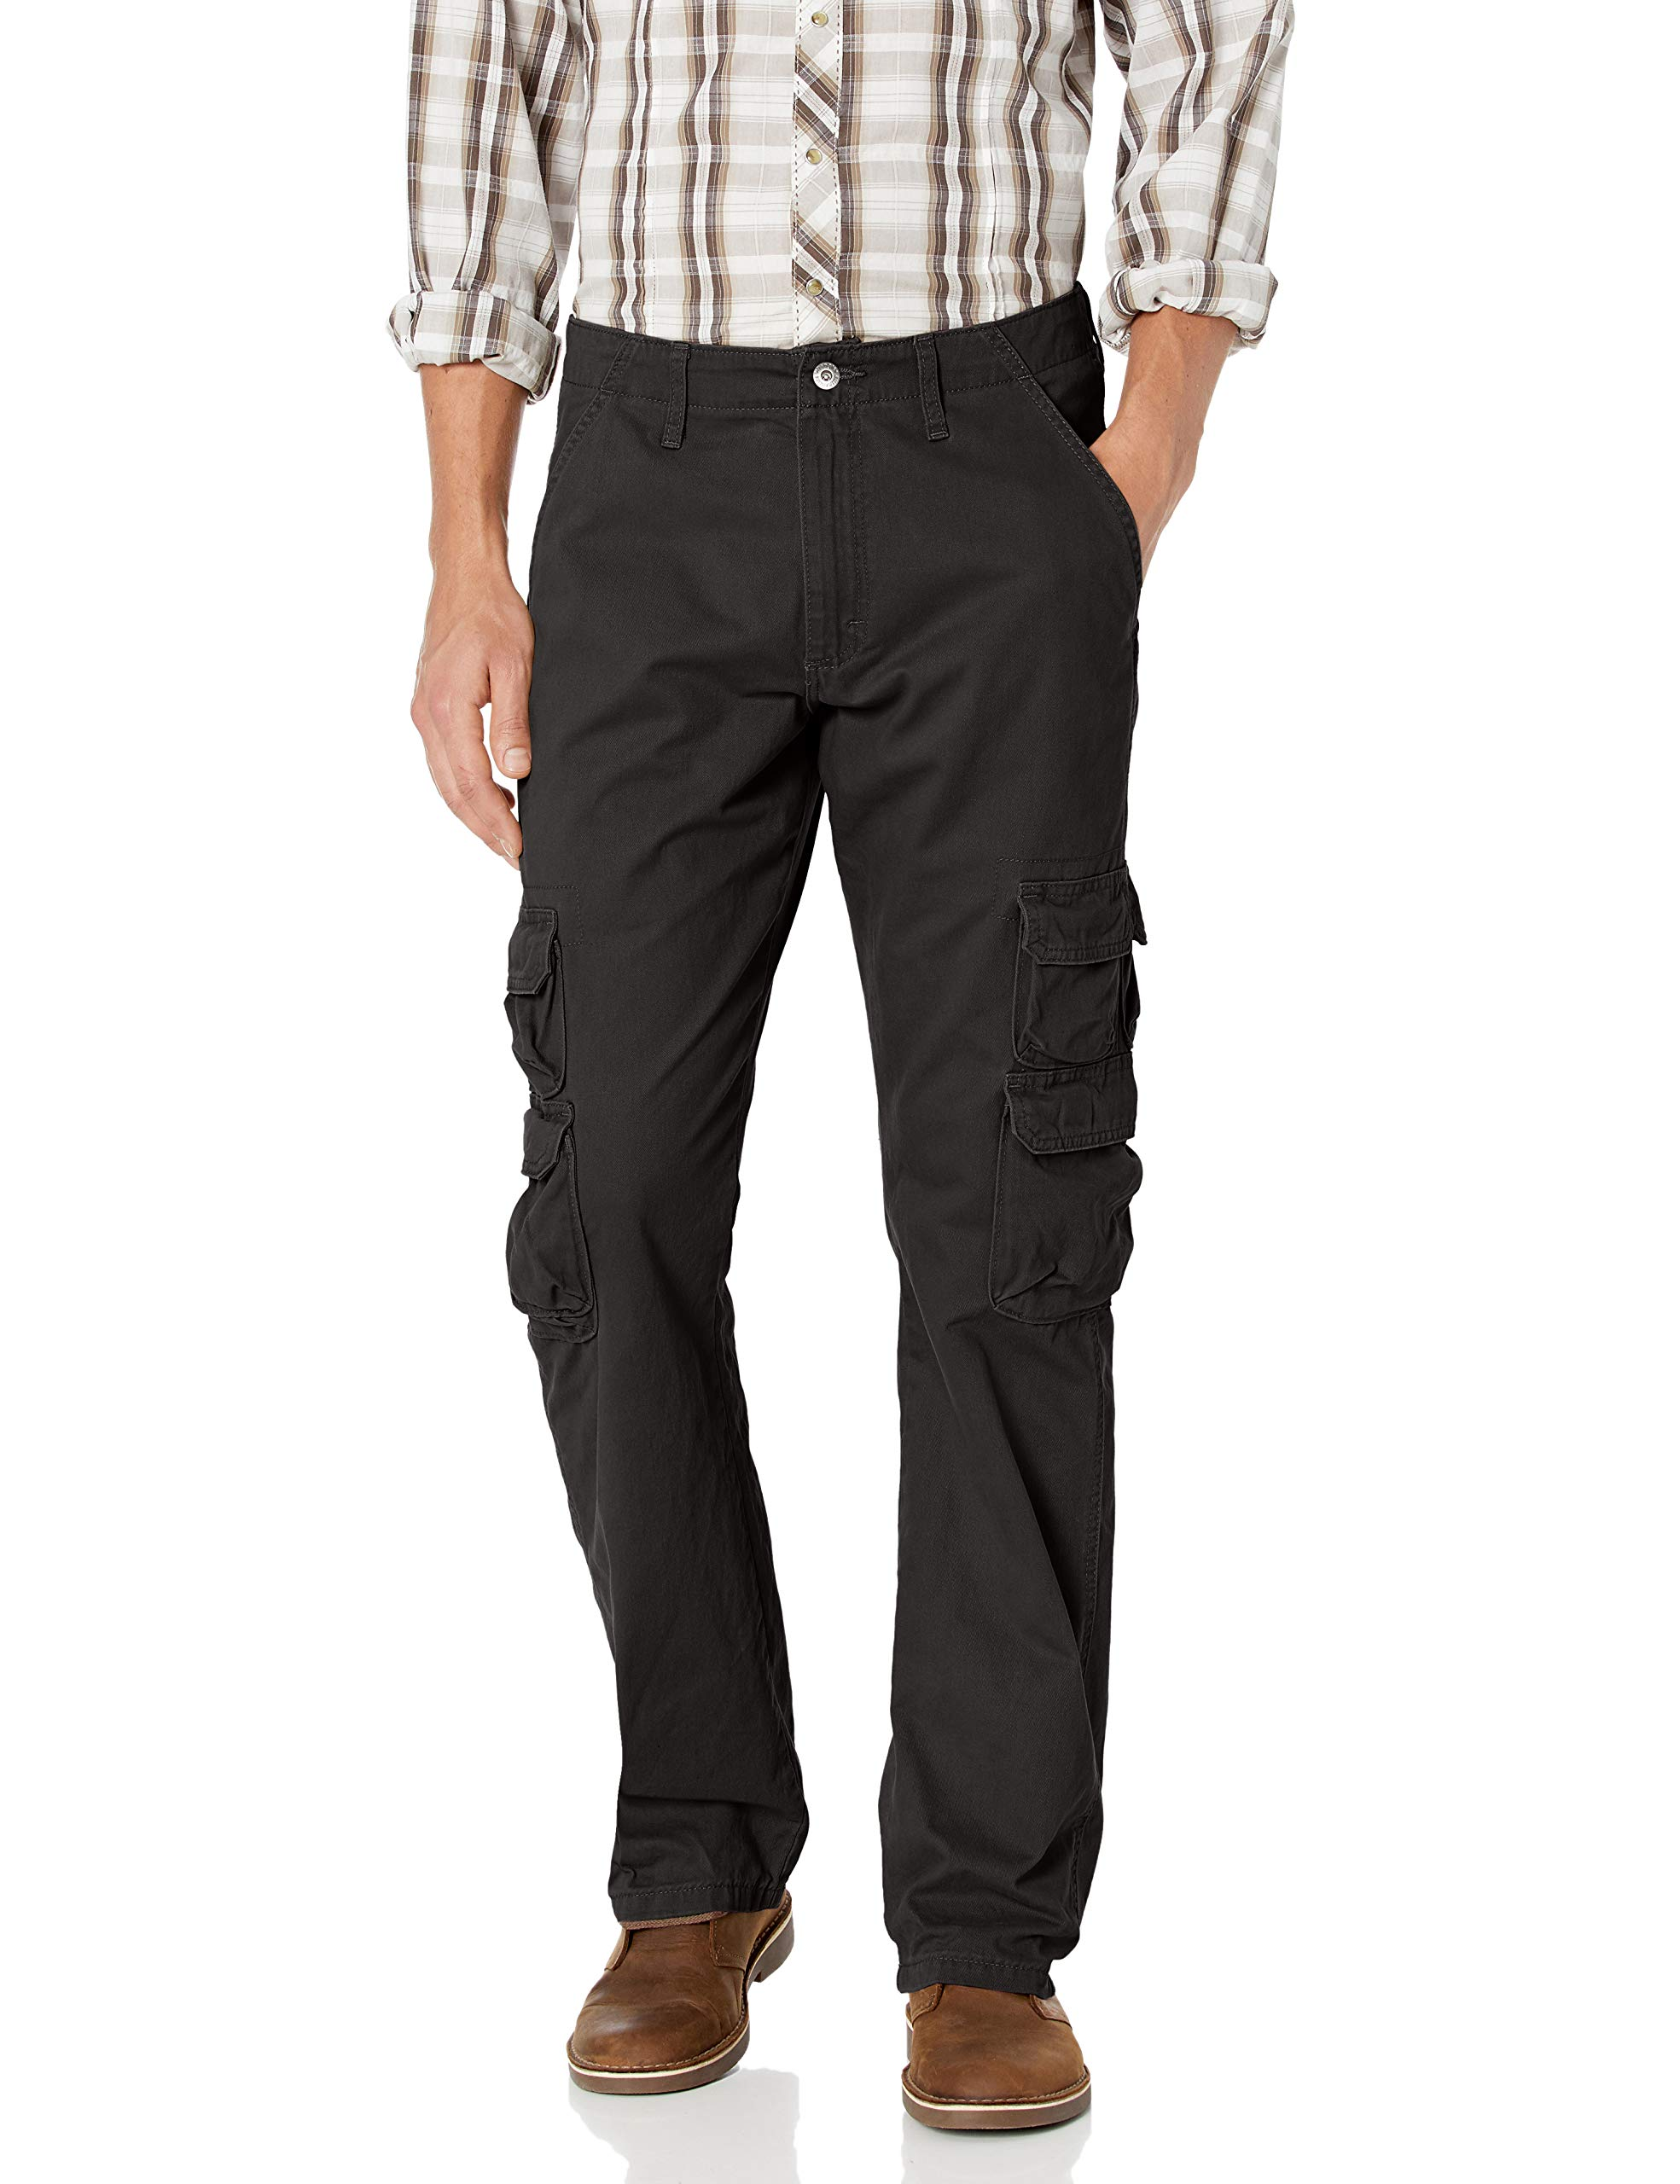 Wrangler Authentics Men's Premium Relaxed Fit Straight Leg Cargo Pant